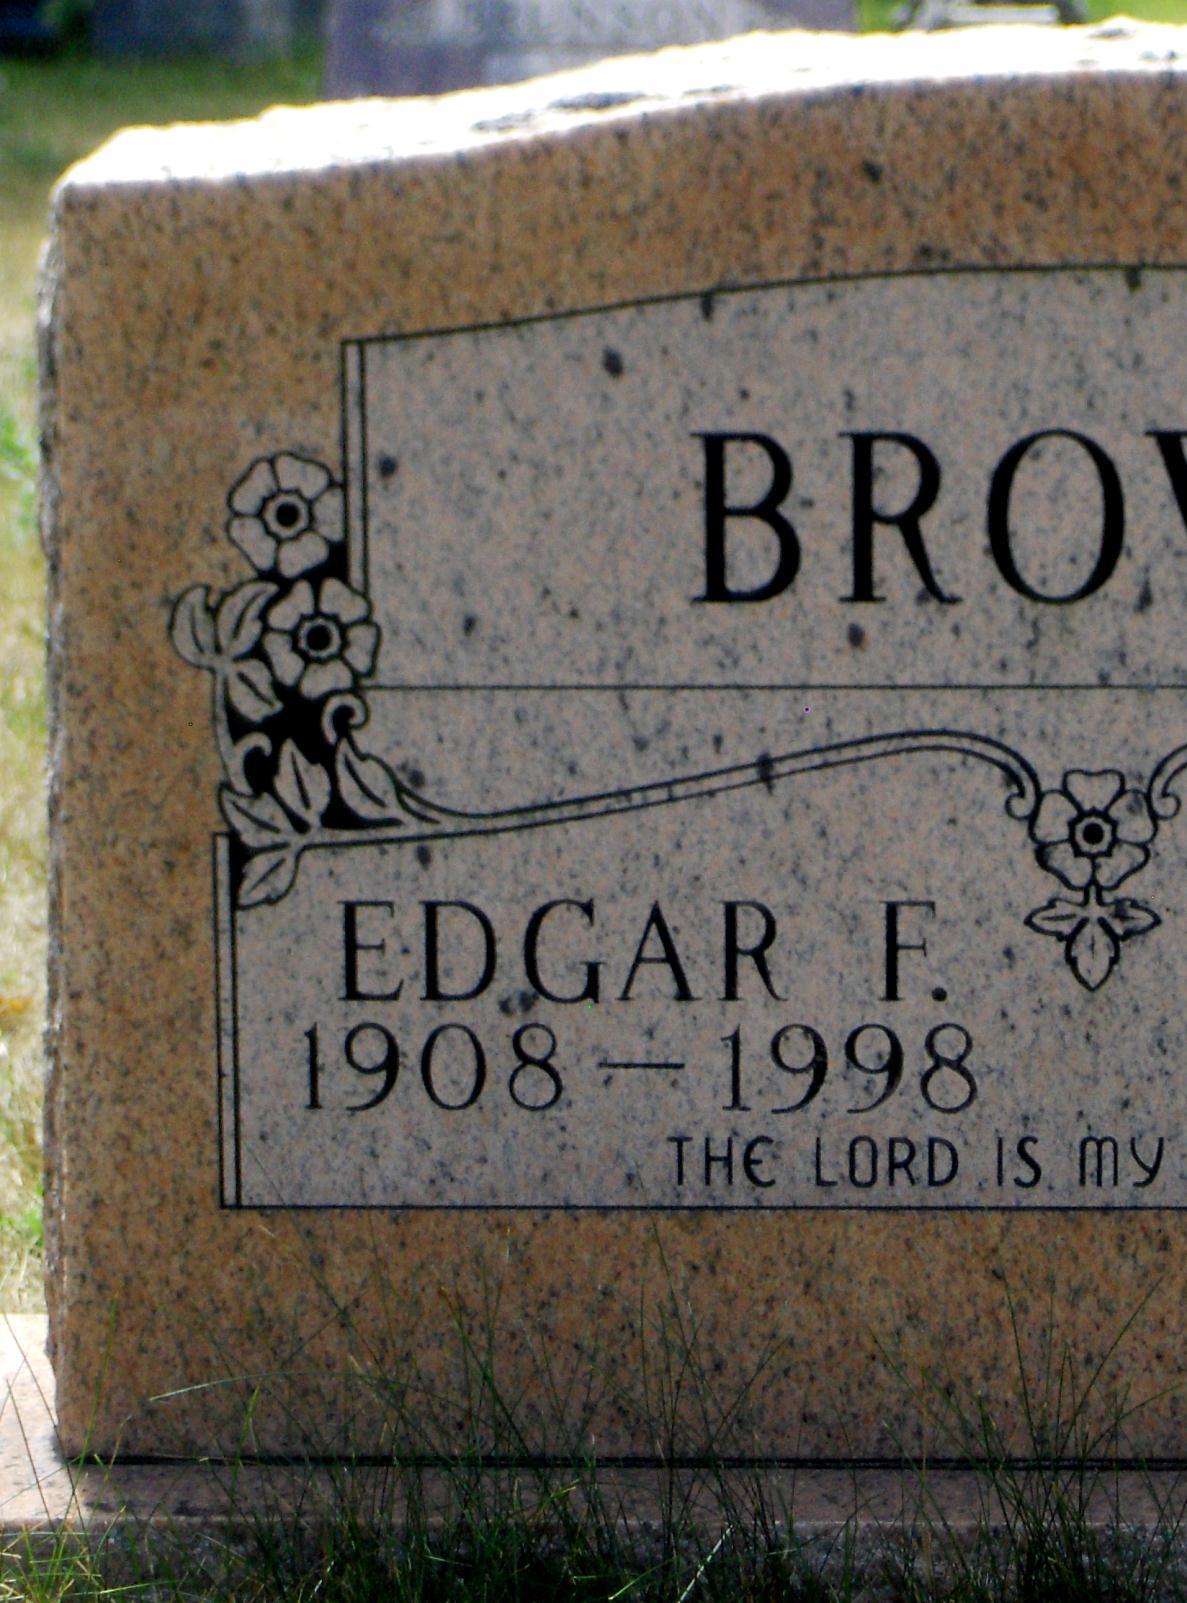 Edgar F. Brown